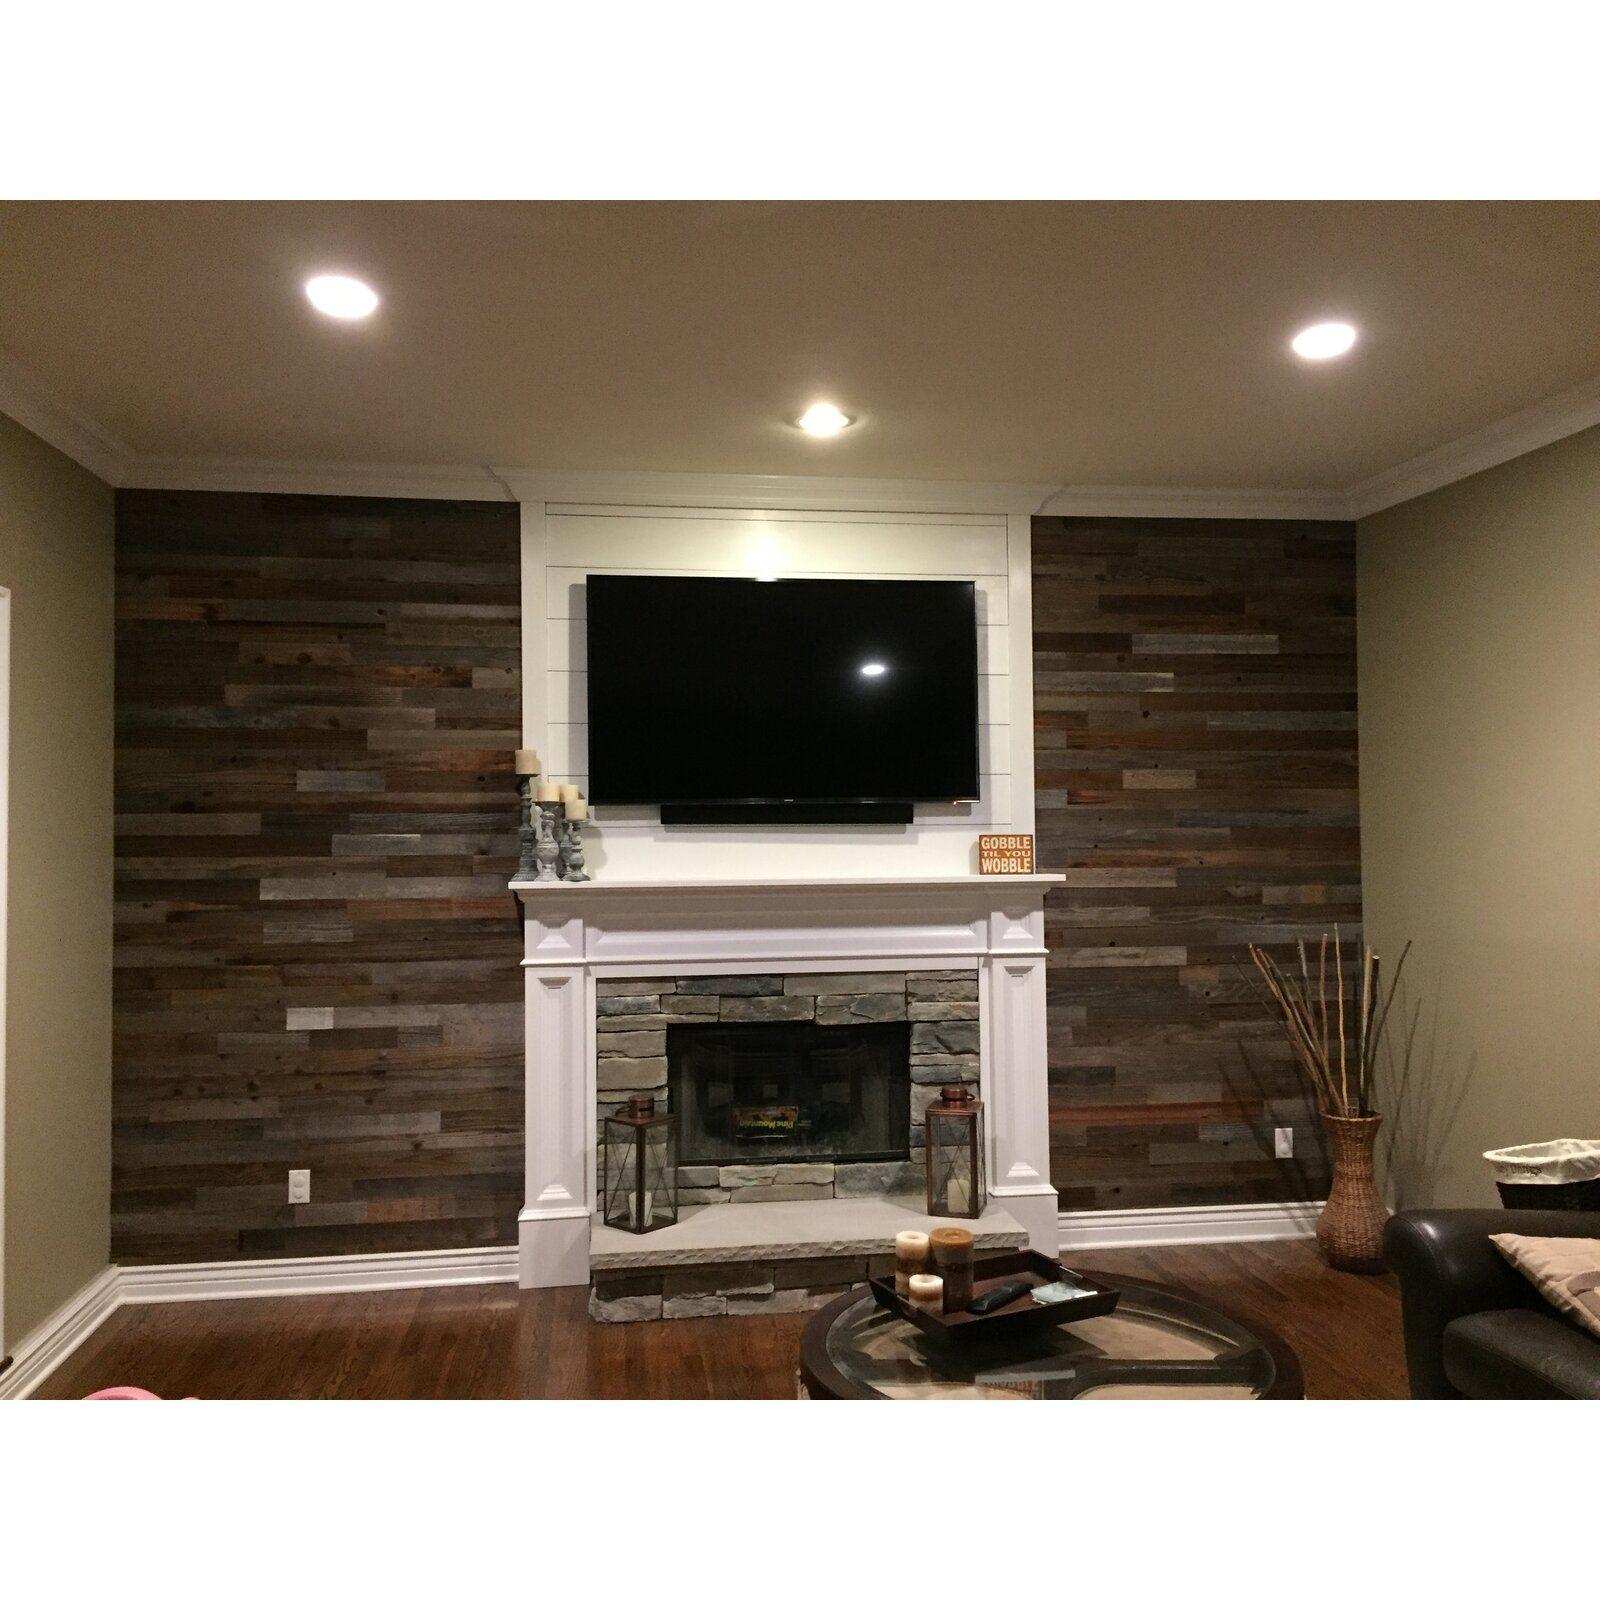 "amazing living room built ins reclaimed wood tv | PlankandMill 3"" Reclaimed Barnwood Peel and Stick Wall ..."